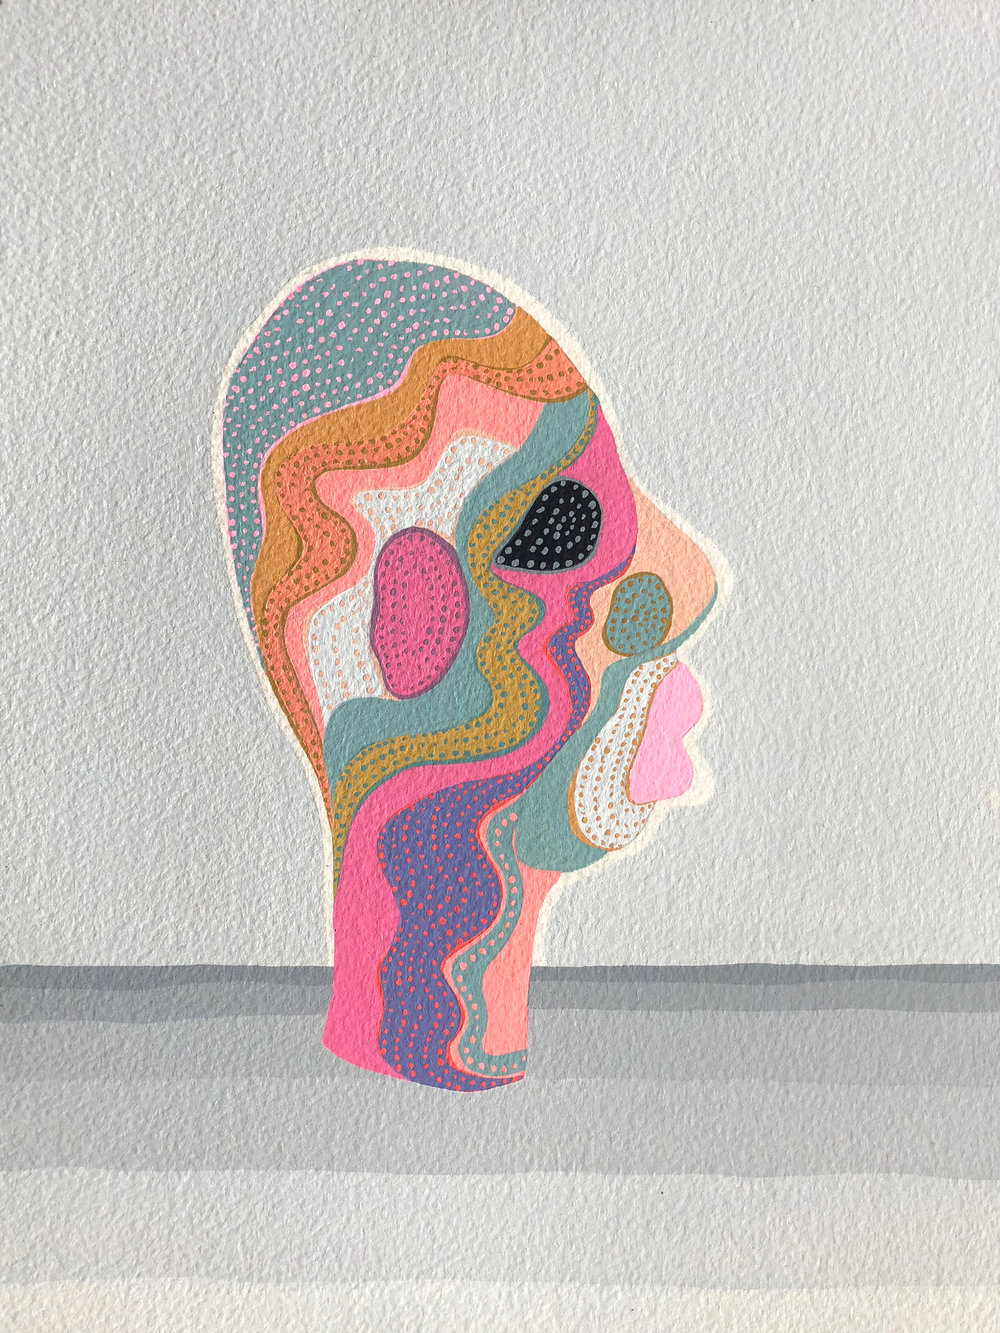 hypercolour head III